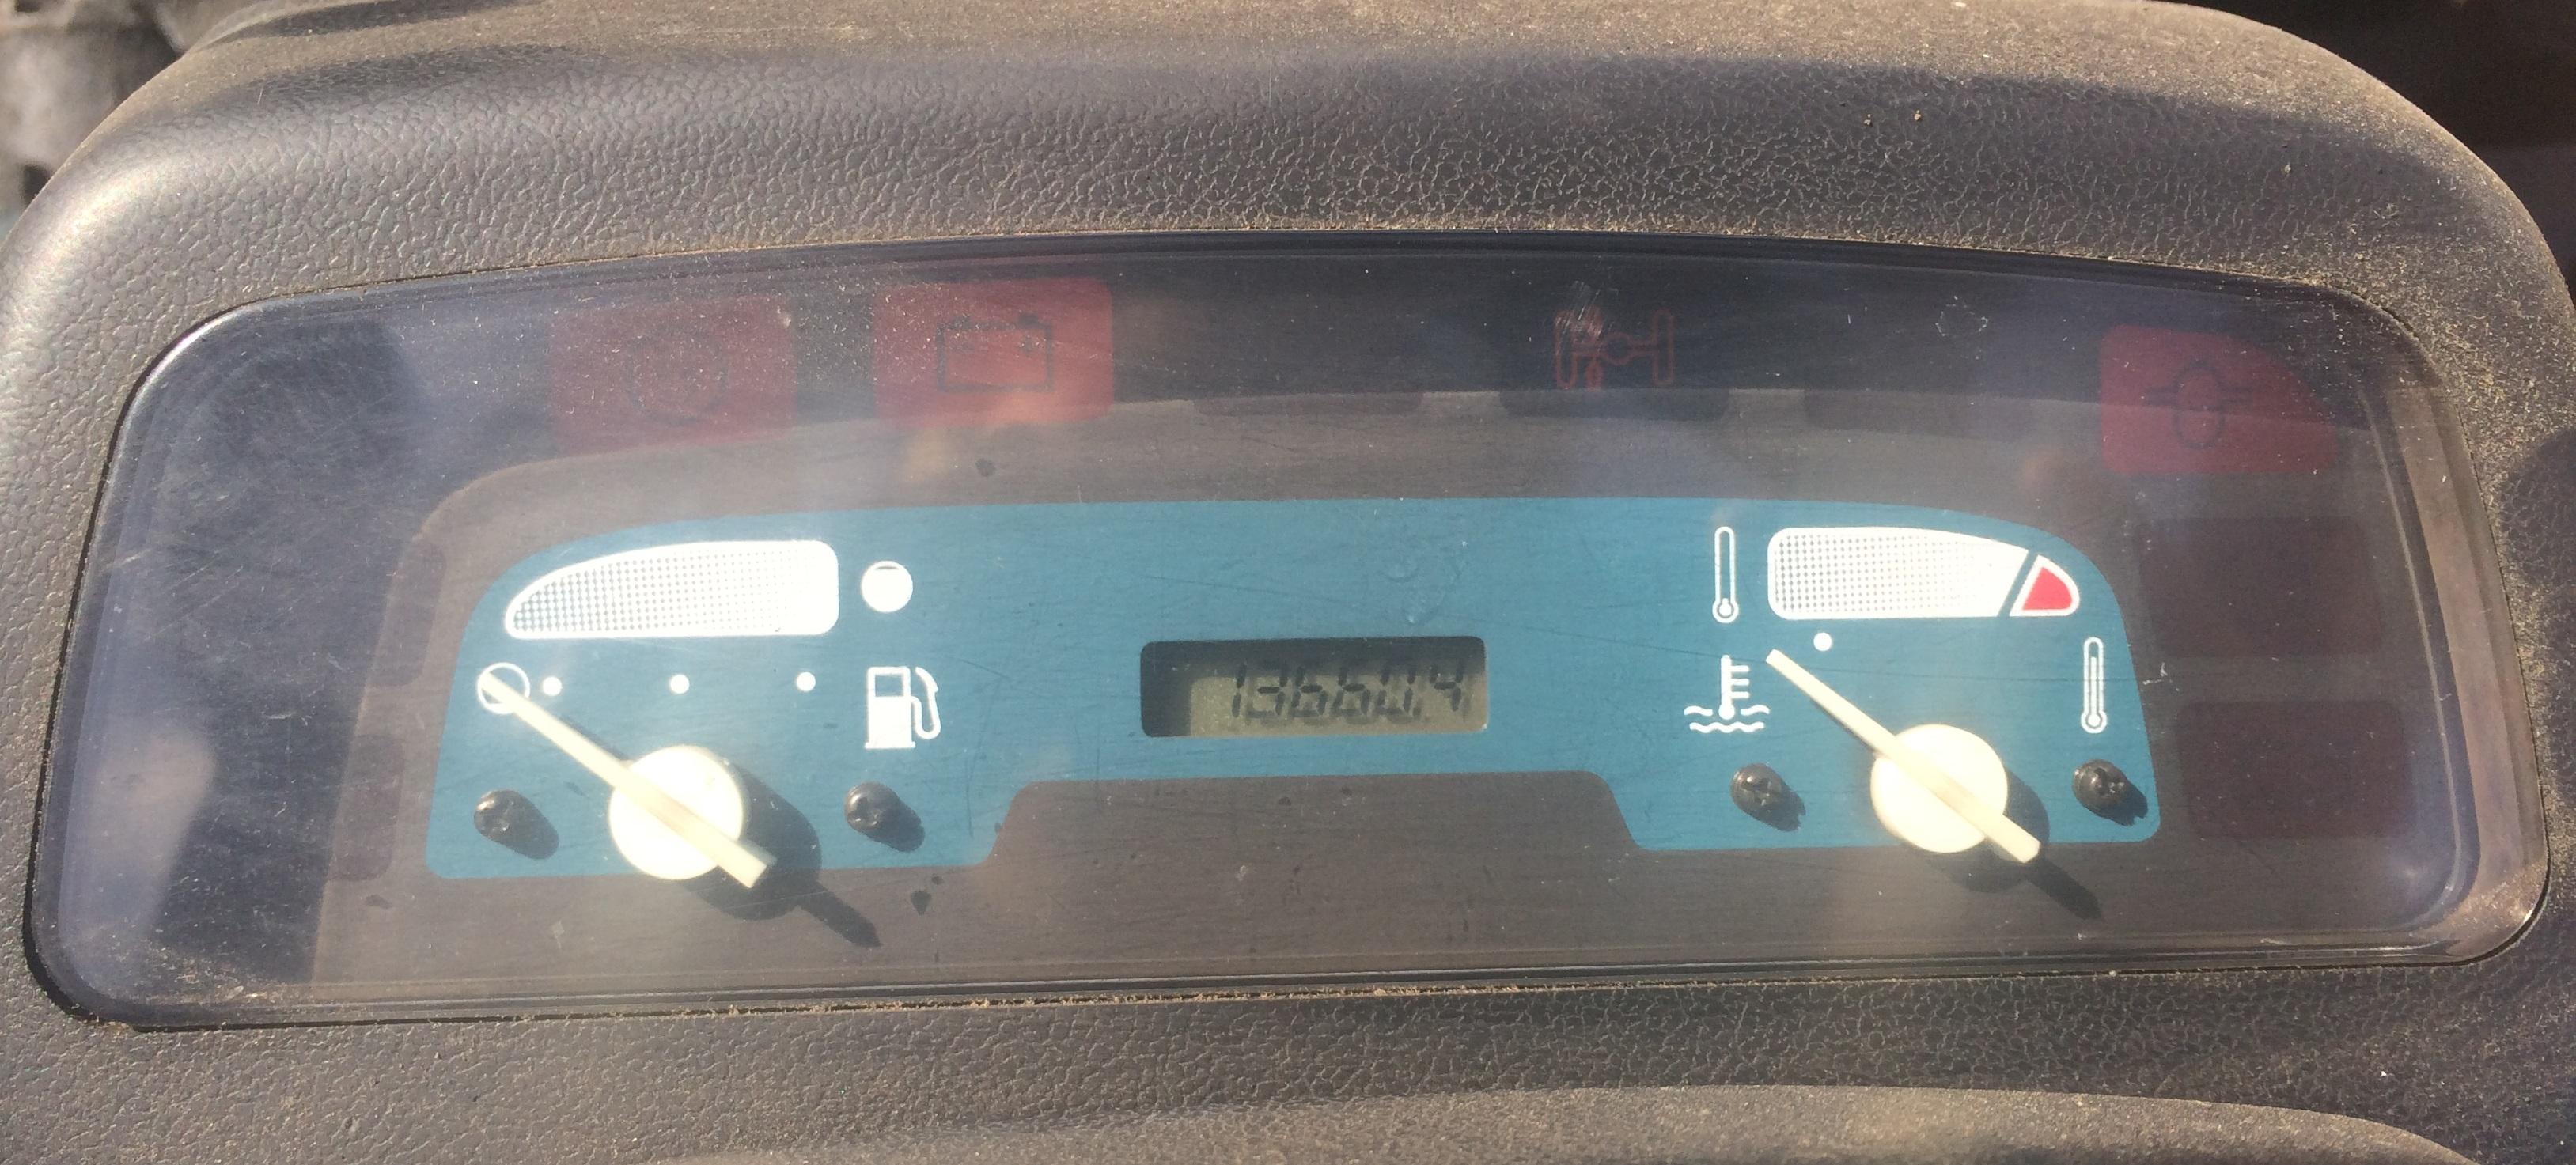 Toyota-62-7fd25-panel-2